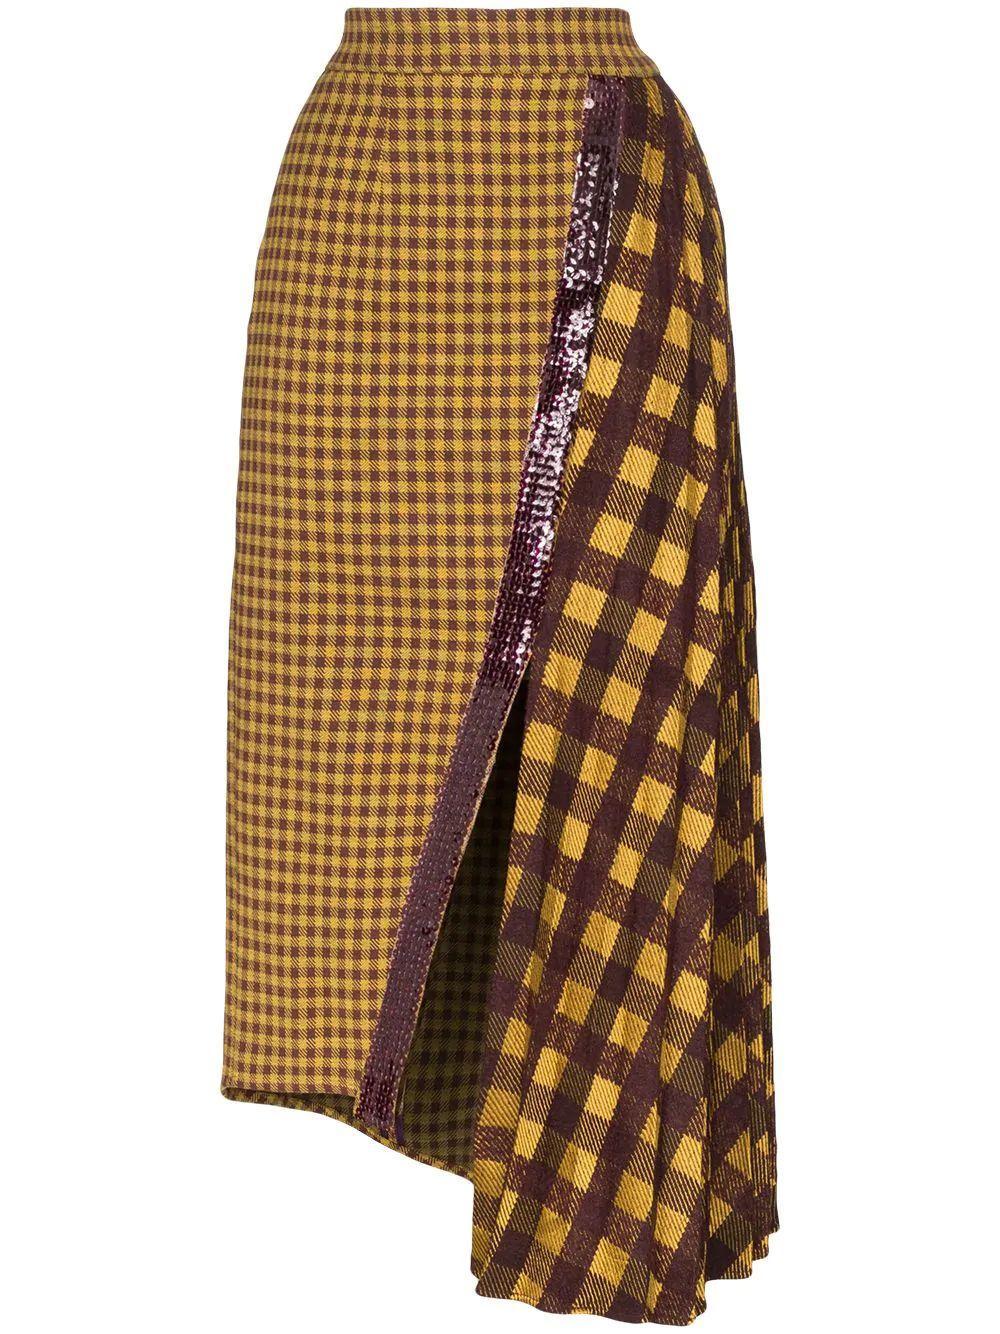 Check Midi Skirt With Slits Item # DOLLY-SKIRT